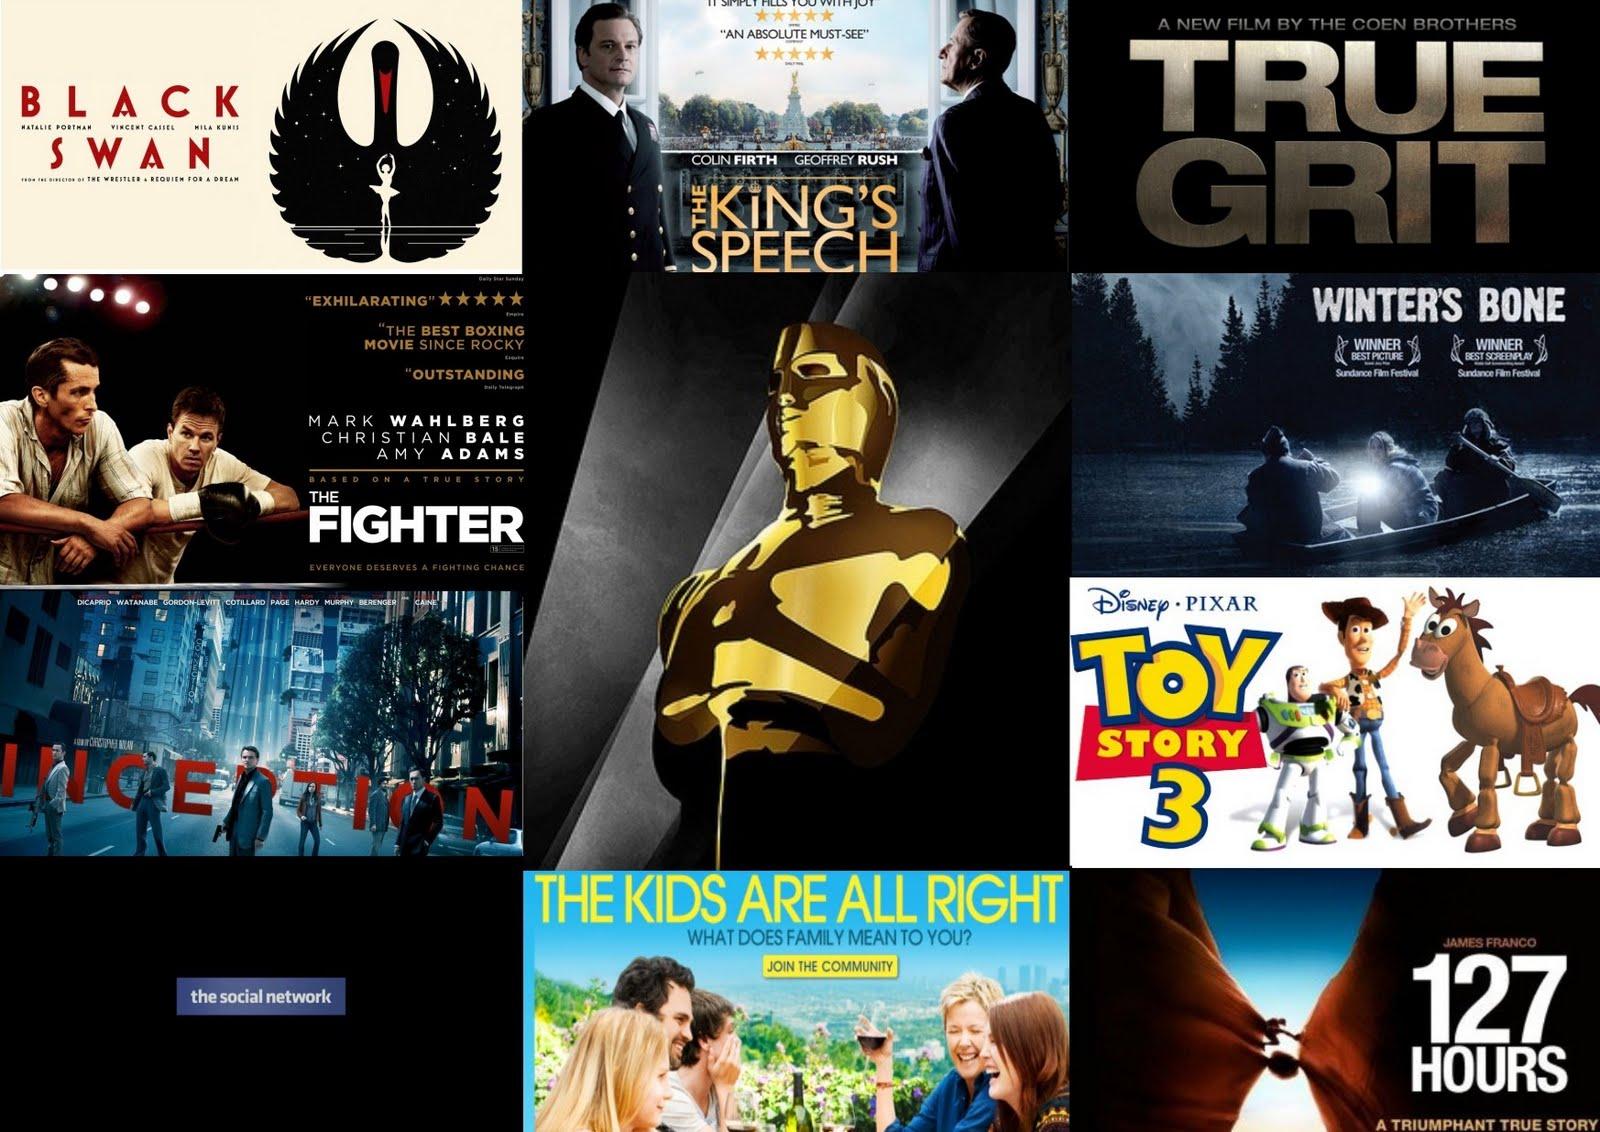 http://2.bp.blogspot.com/-oH52cqfYBZA/TVz6xq3xv6I/AAAAAAAAAbs/rq6JiIPmY6Q/s1600/oscar%2Bbest%2Bfilm%2Bnominations%2B2010.jpg